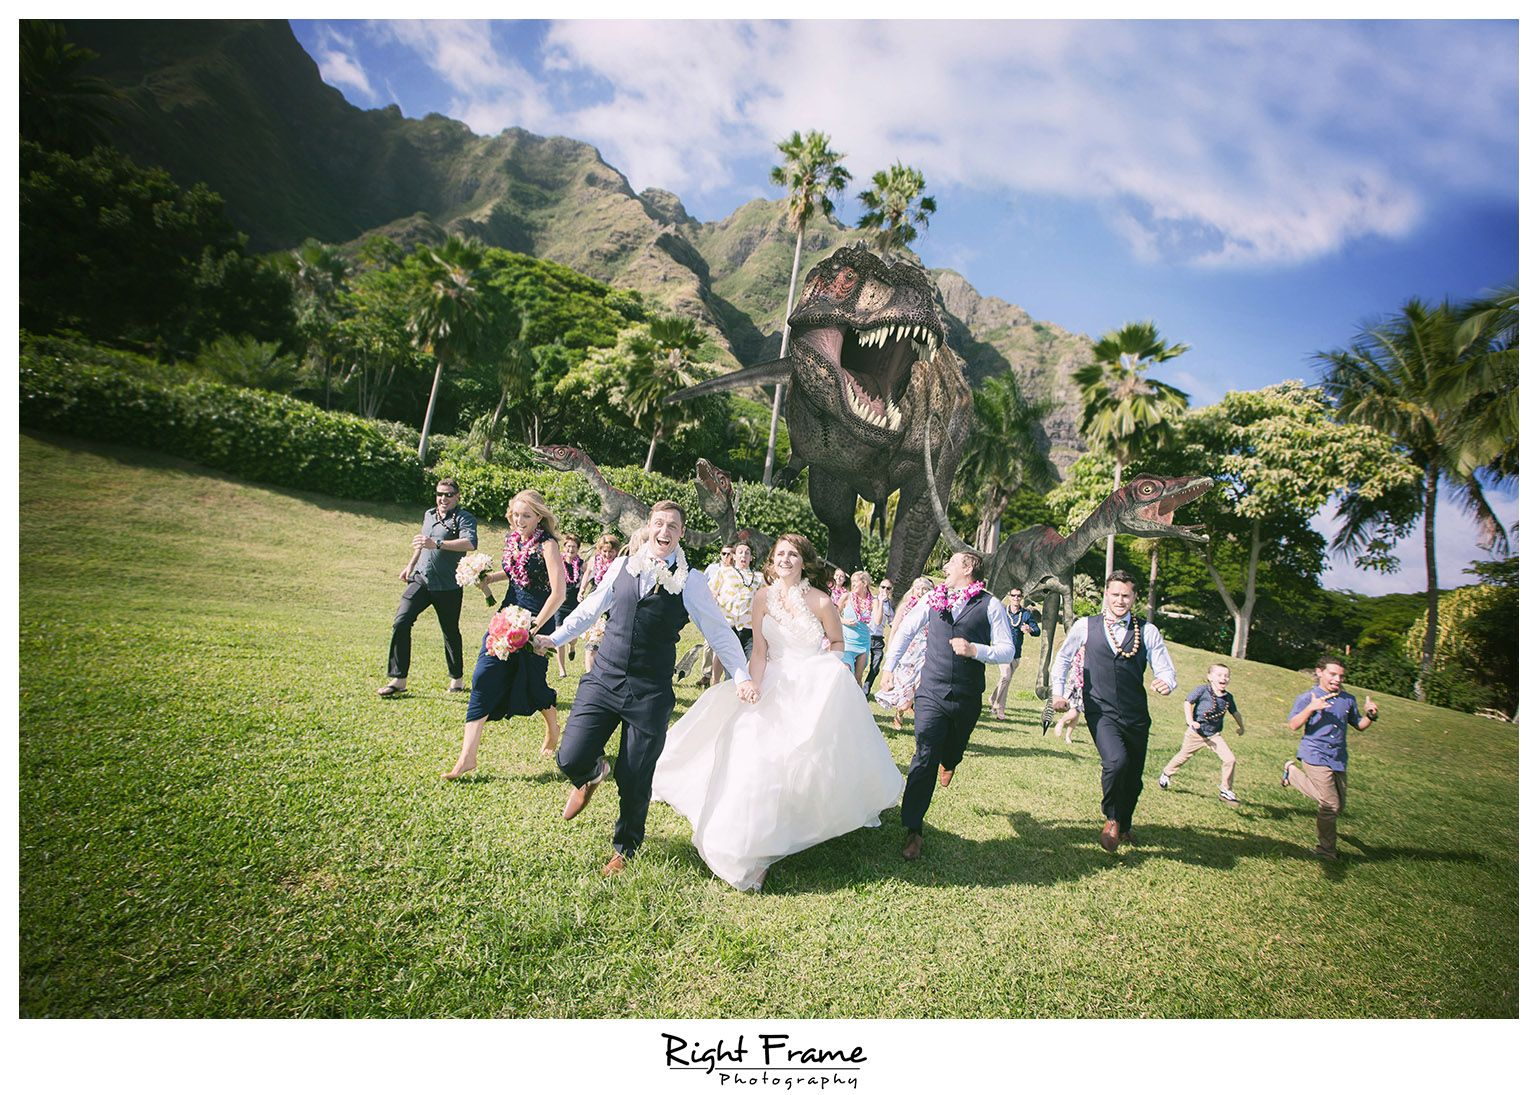 Molii pond kualoa regional park t o h a v e t o h o l d rightframe jurassic park dinosaurs at kualoa ranch wedding paliku hawaii weddingdestination junglespirit Image collections